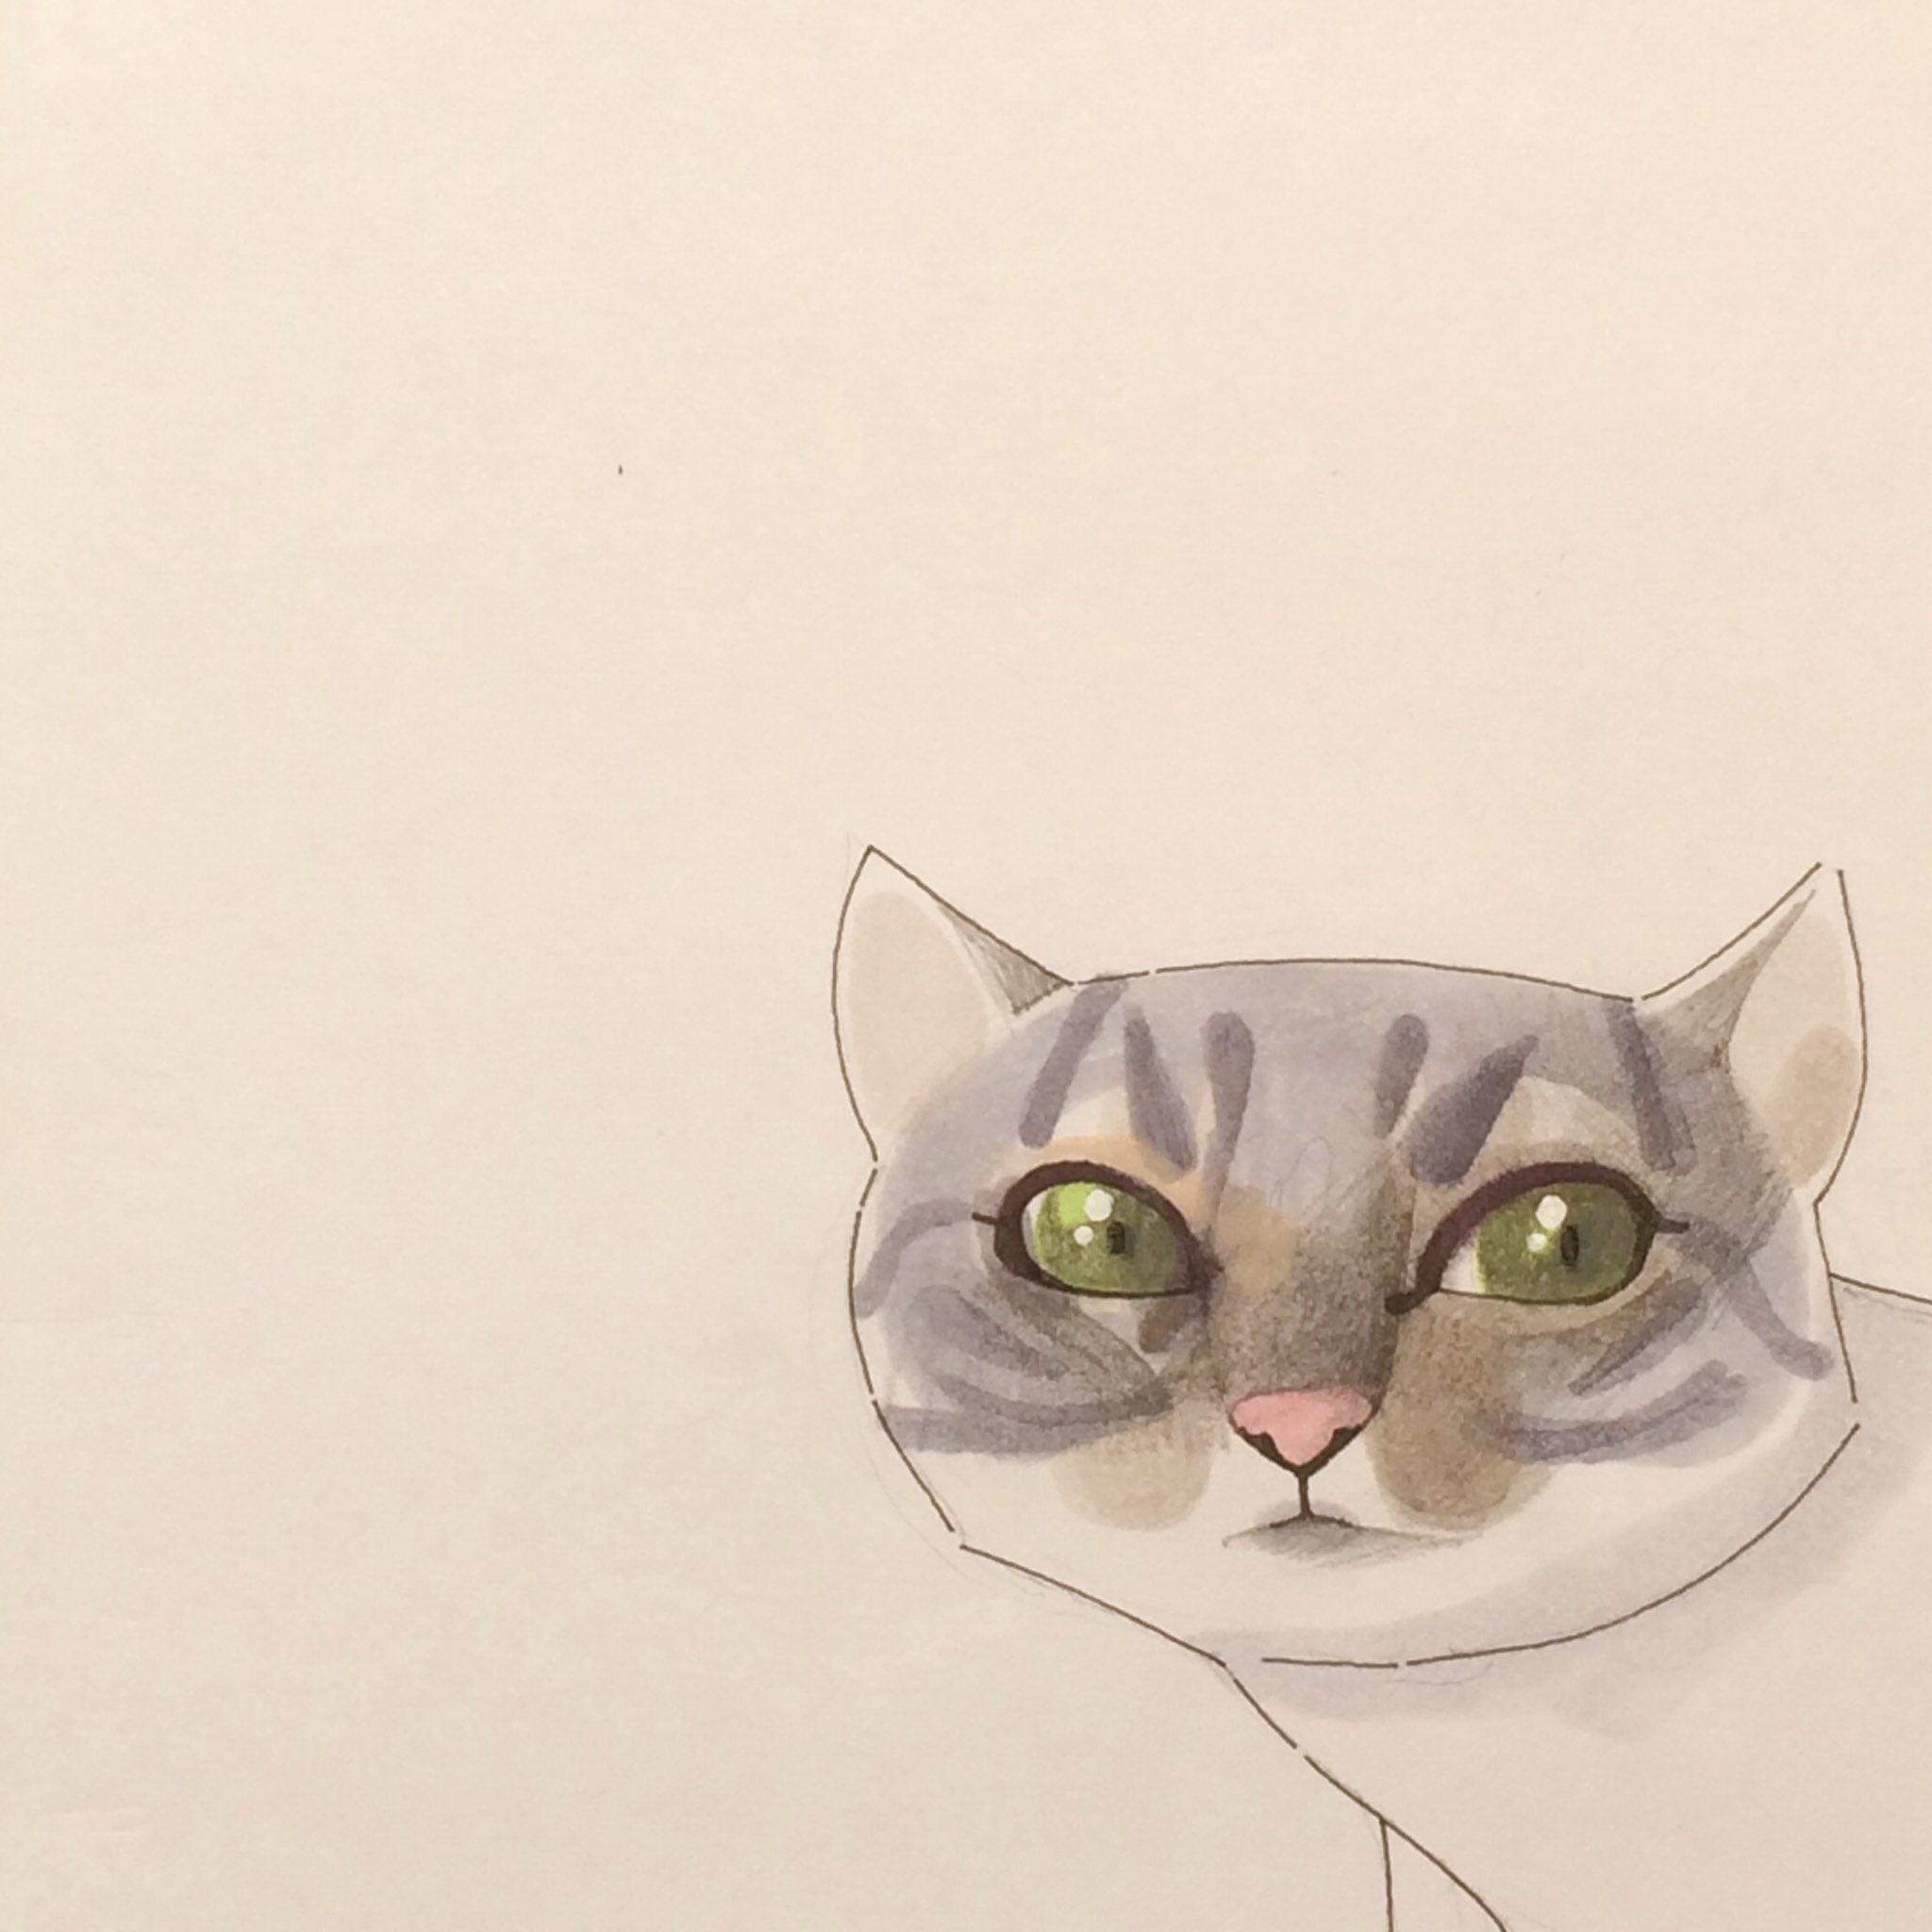 felino | cat - victorgarciabernal | ello